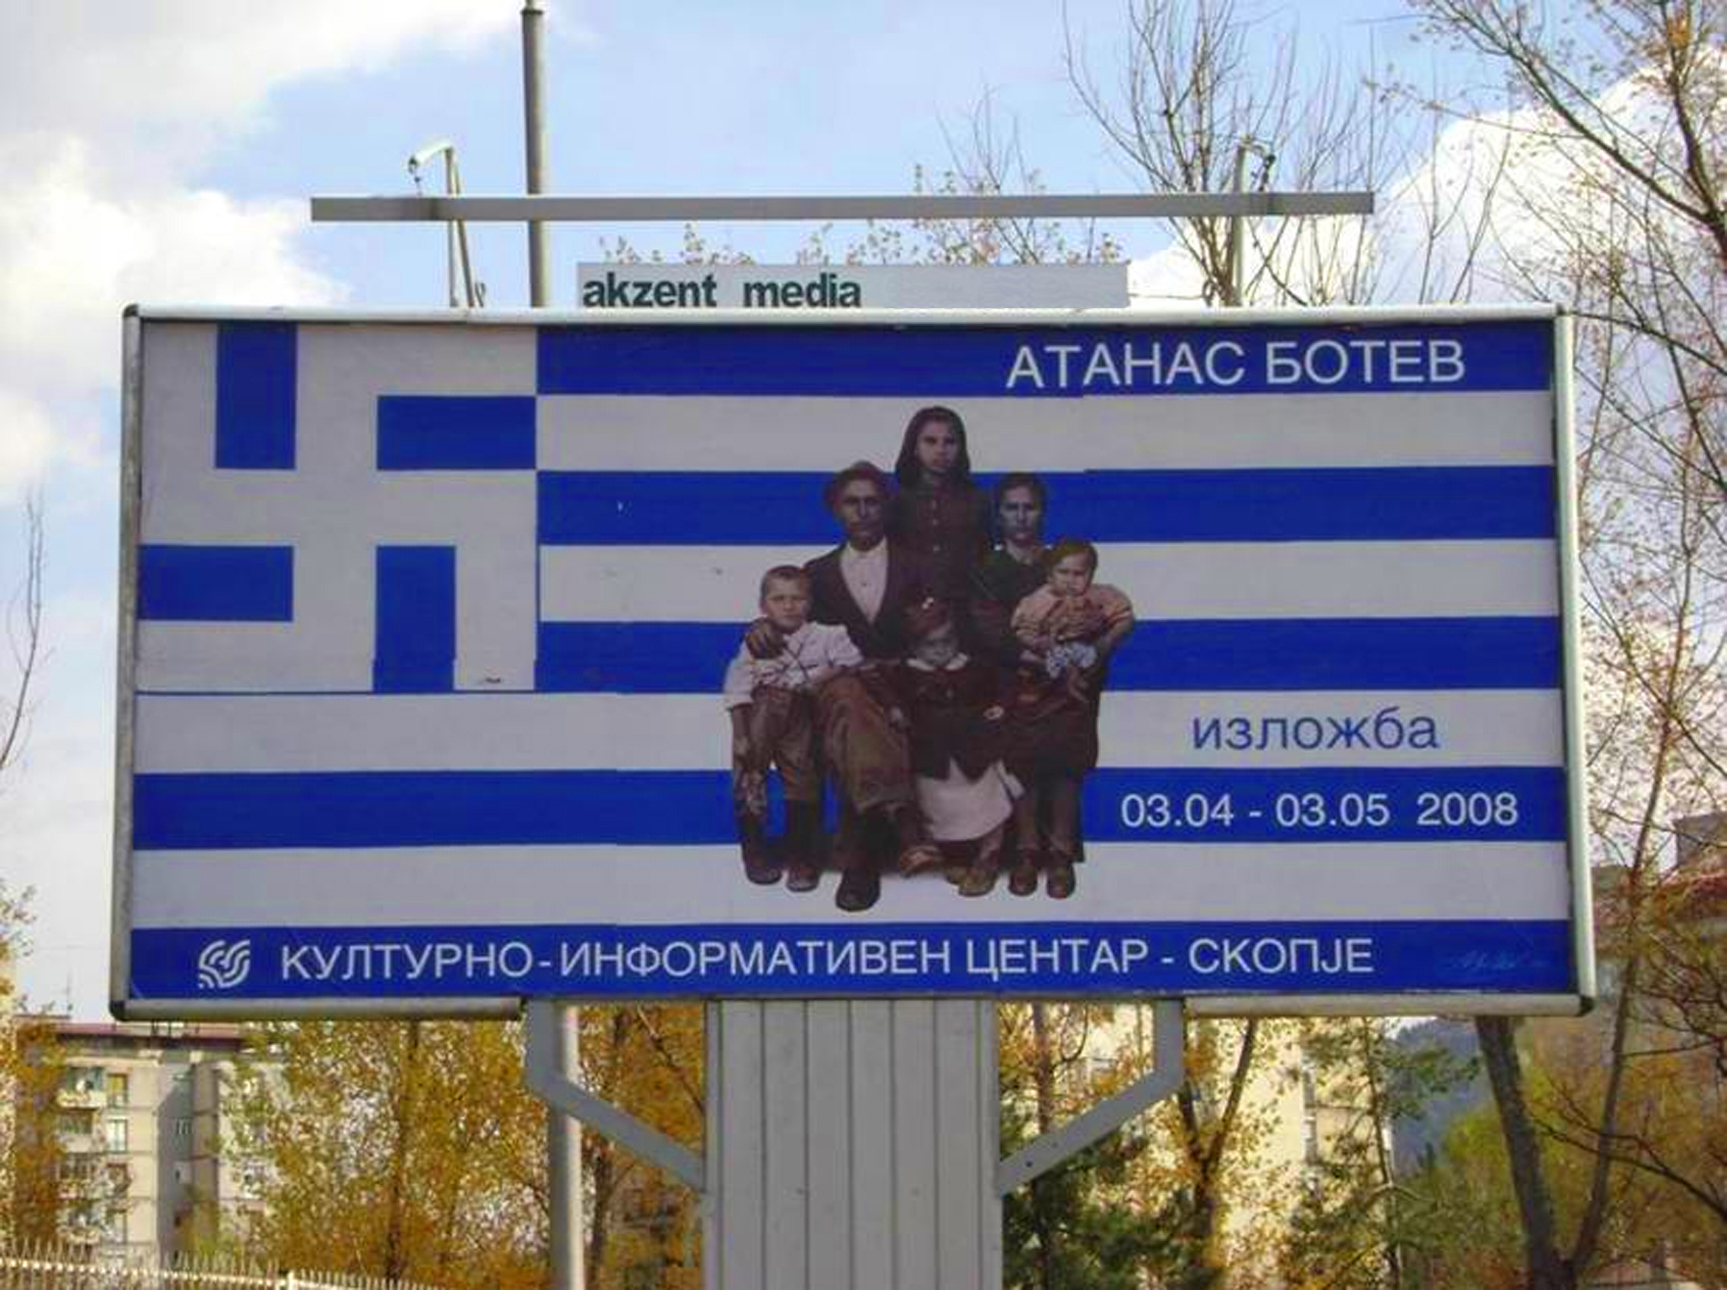 Greece apologizes for racist chants | Turkey & Macedonia